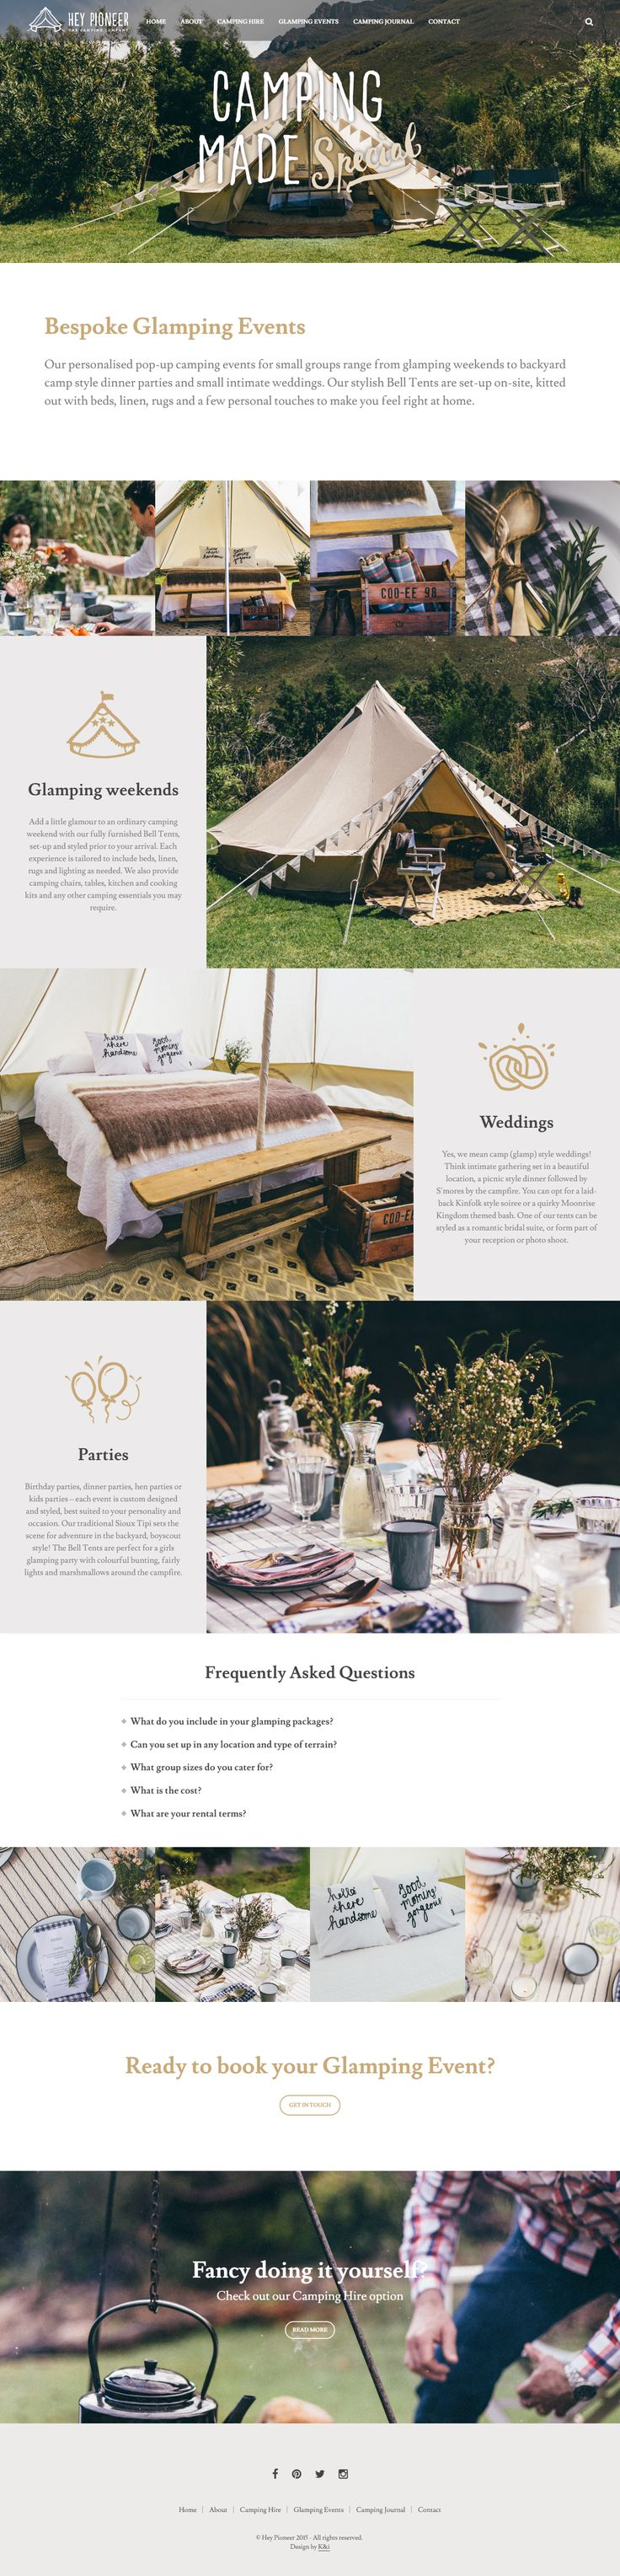 Amazing site powered by Shopkeeper WordPress theme for heypioneer.co.za #wordpress #webdesign #branding #glaming #campingsite #bestwebsites https://www.getbowtied.com/hey-pioneer-glamping-company-customer-stories-shopkeeper/?utm_source=pinterest.com&utm_medium=social&utm_content=hey-pioneer&utm_campaign=customer-stories